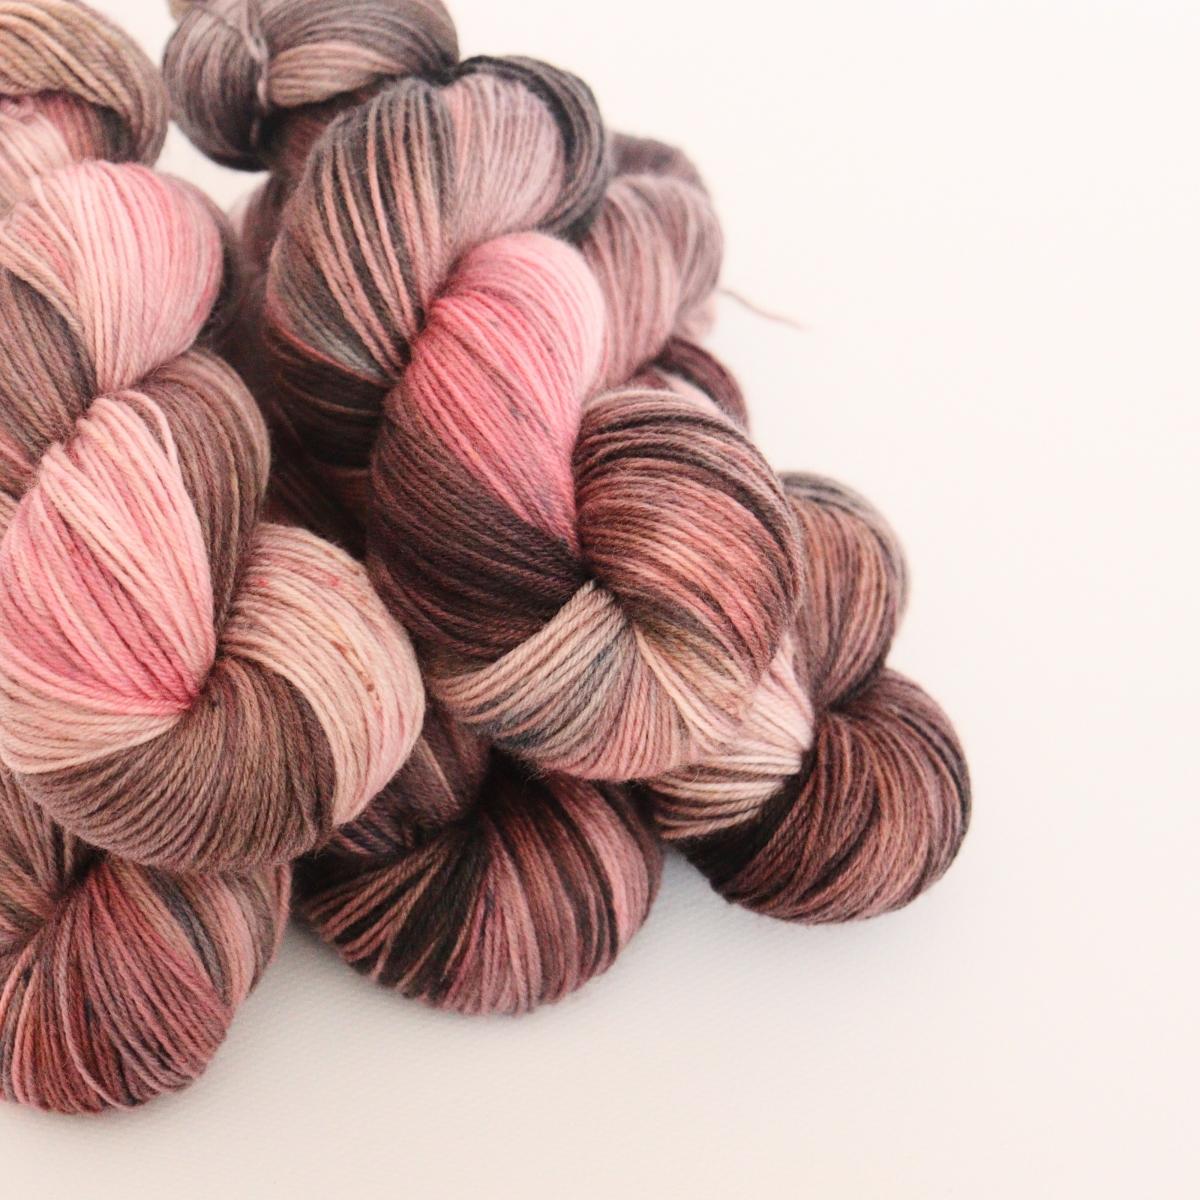 woodico.pro hand dyed yarn 061 2 1200x1200 - Hand dyed yarn / 061